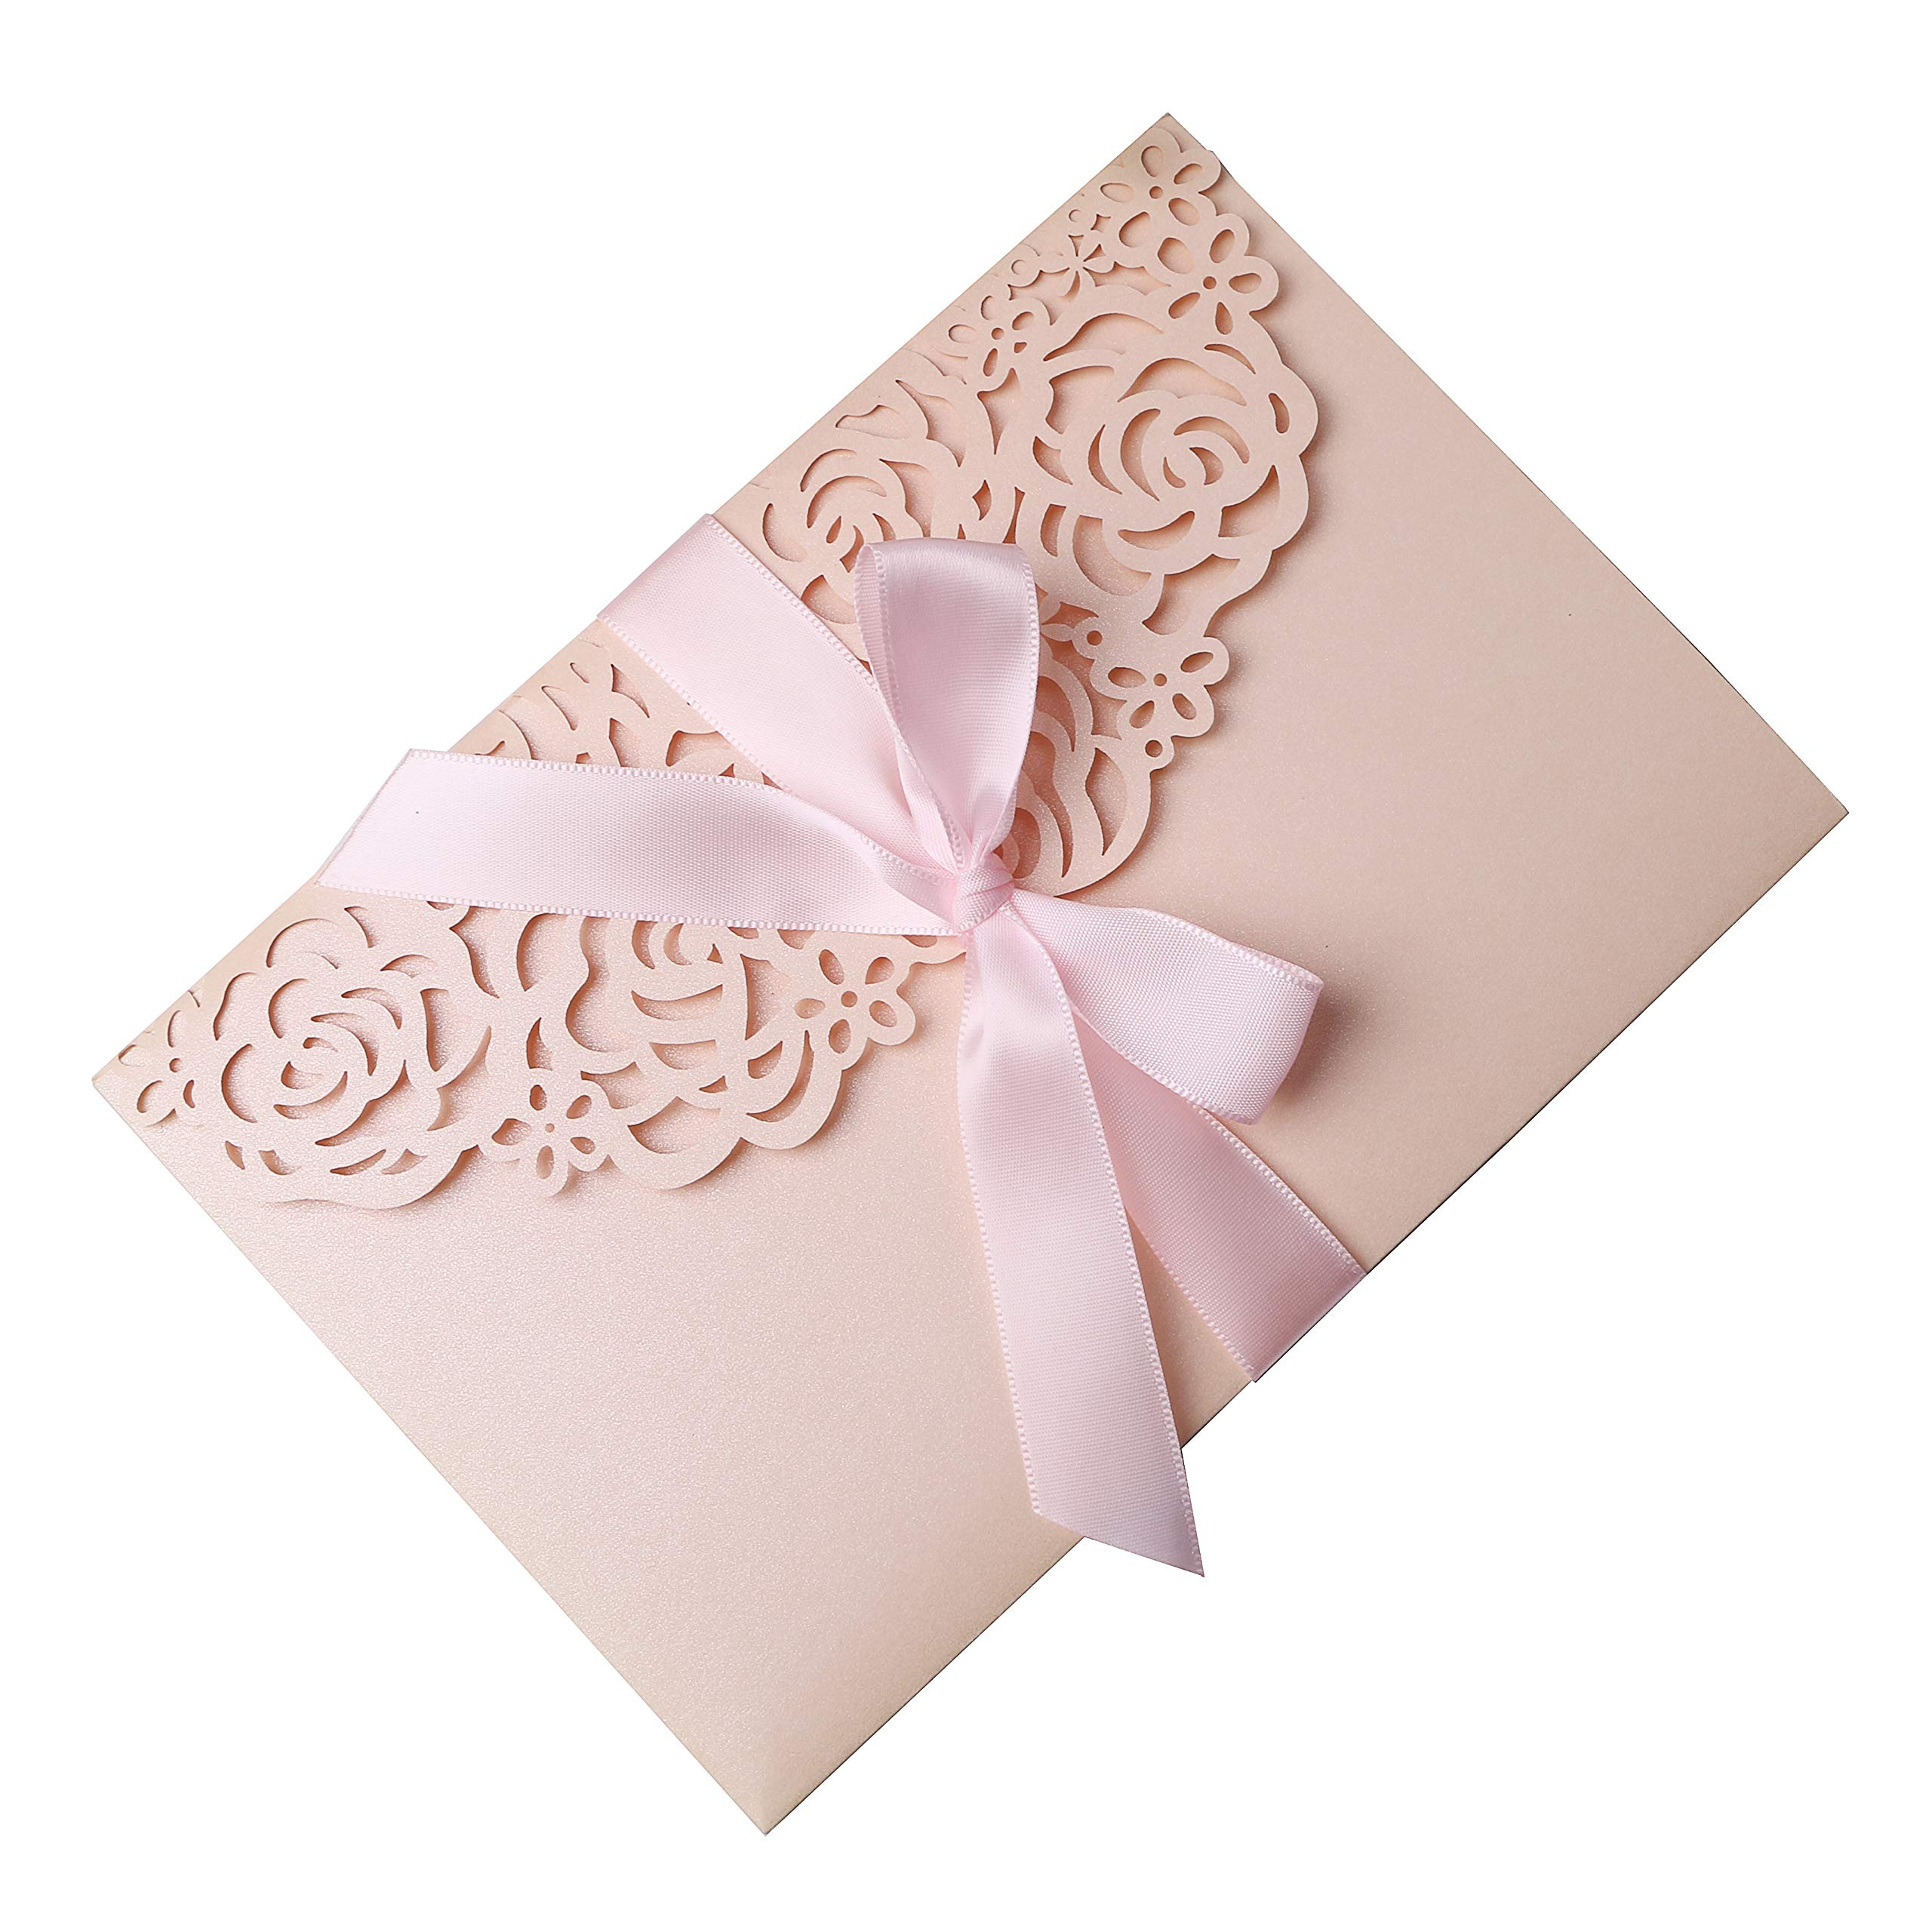 PONATIA 20PCS 3 Folds Burgundy Wedding Invitations Cards with Ribbons for Wedding Bridal Shower Engagement Birthday Graduation Invitation Cards (Blush Pink)